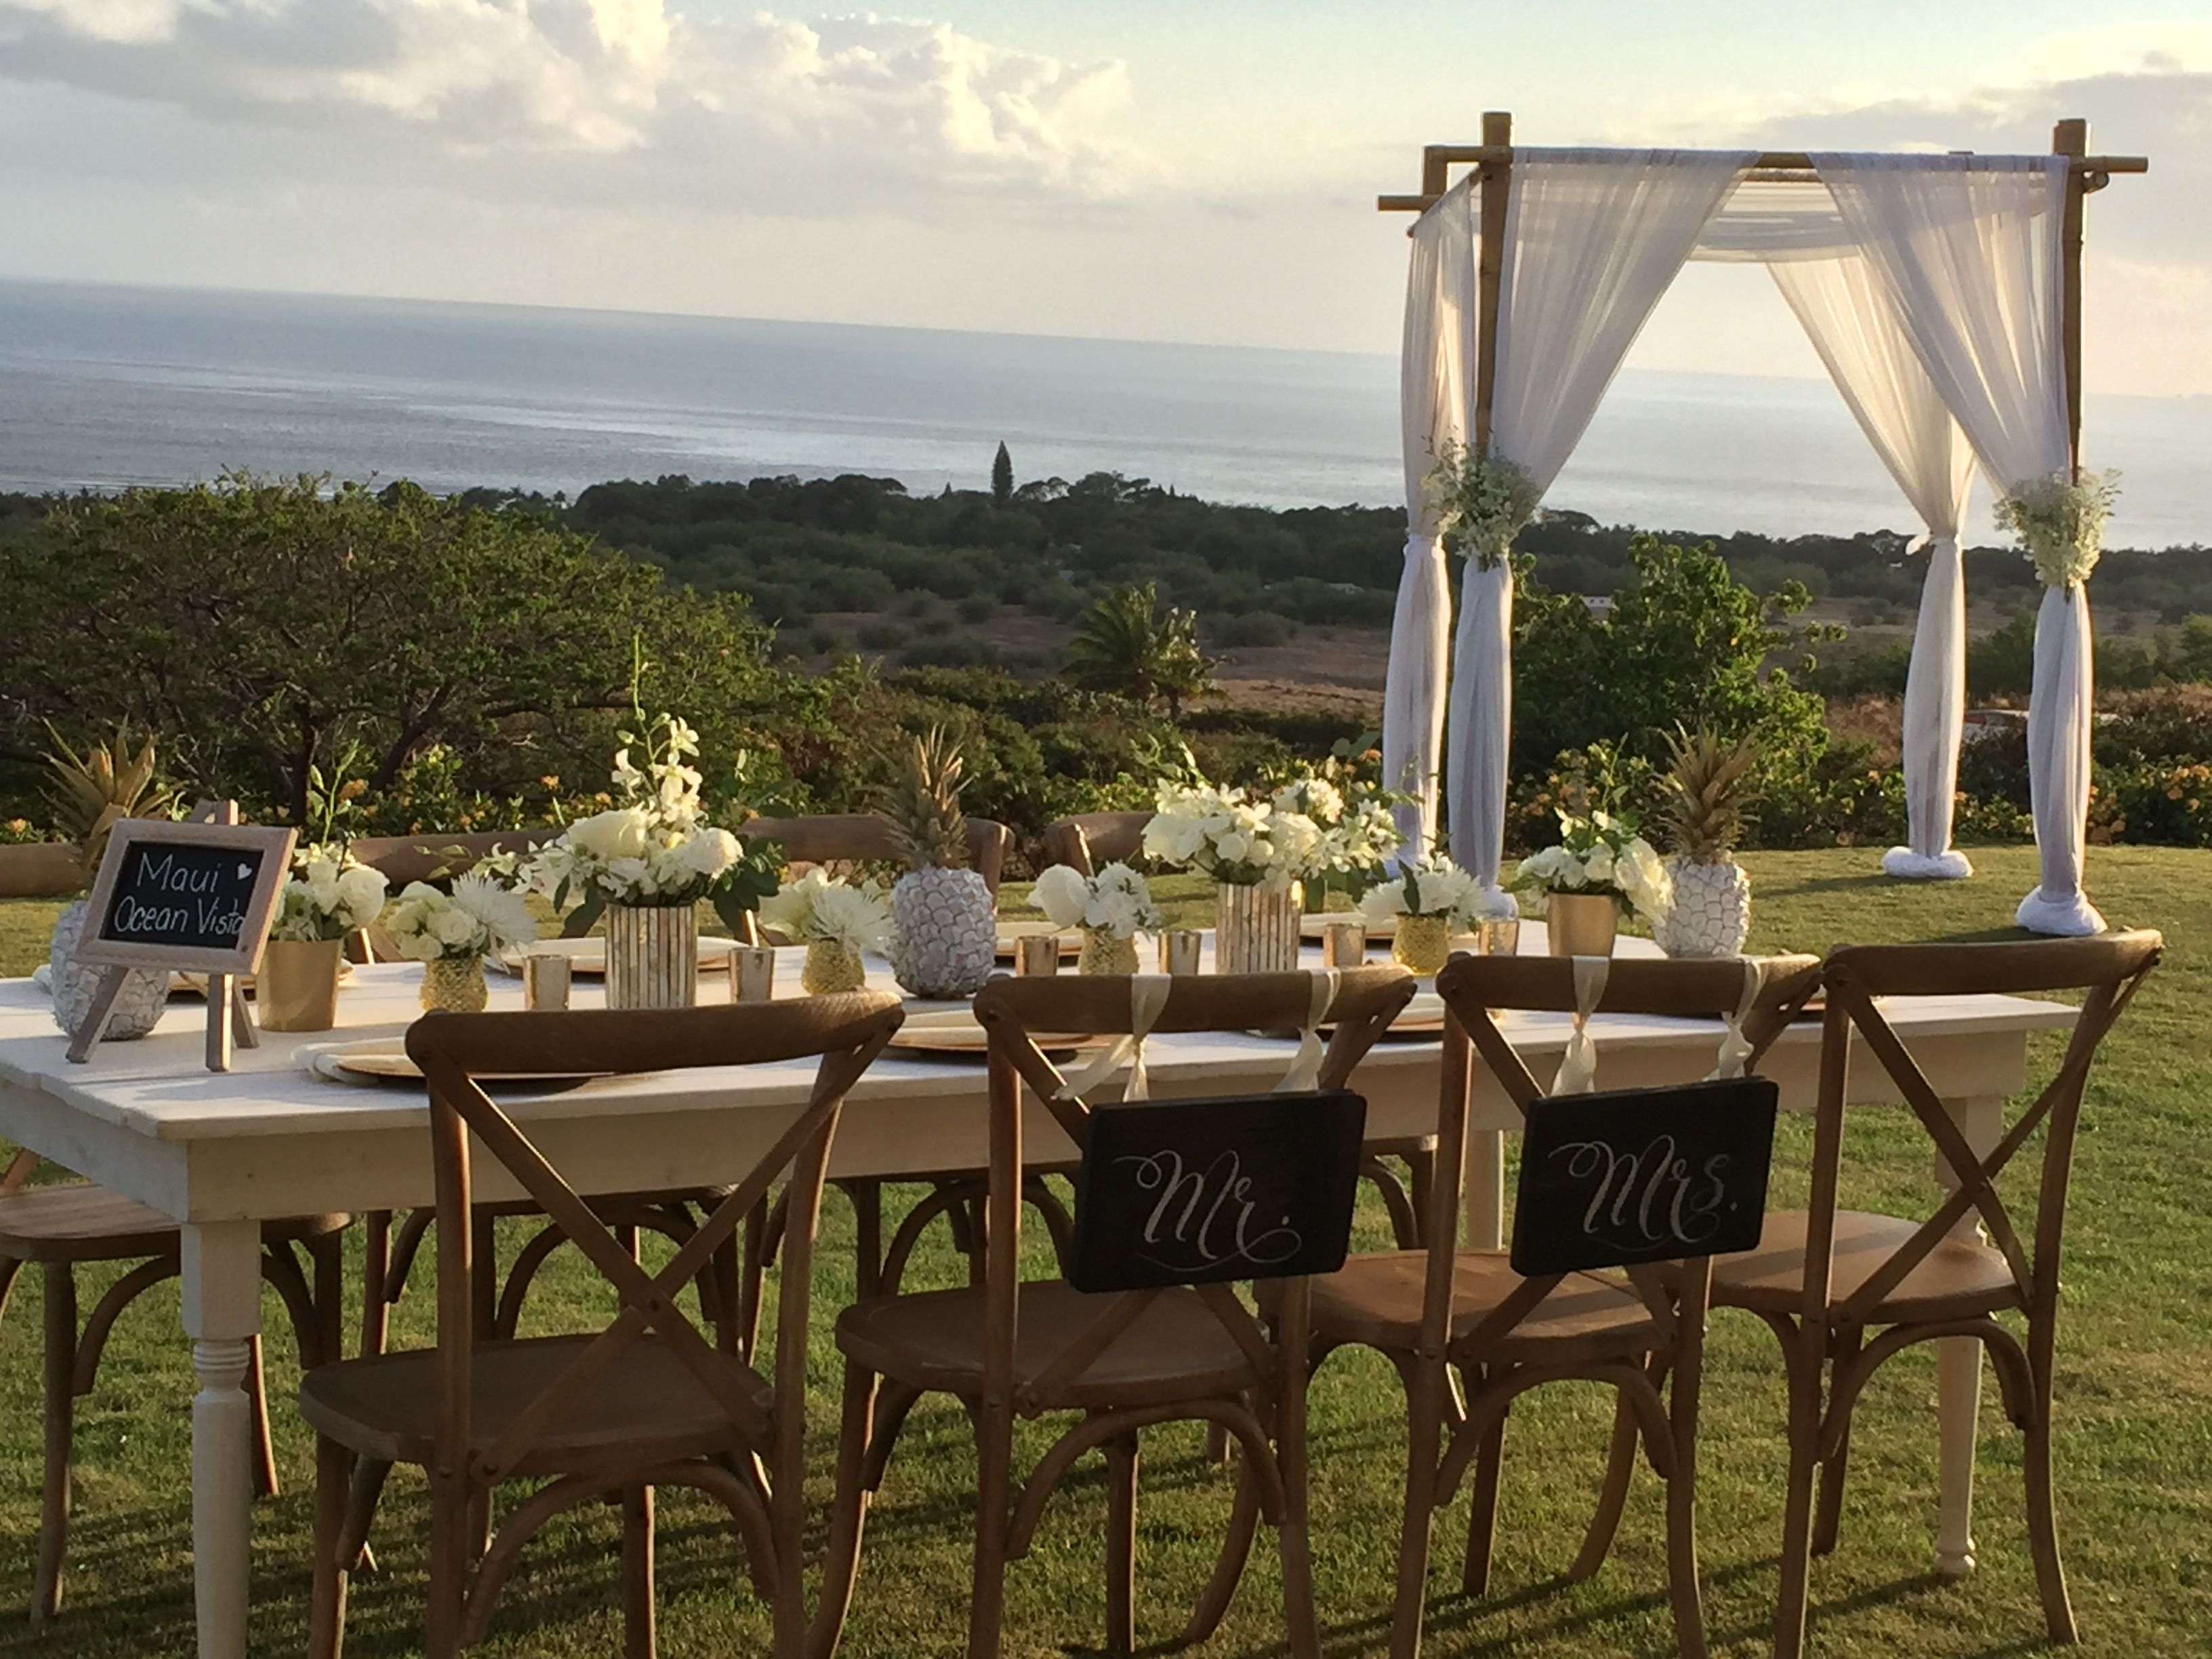 Beautiful Maui private wedding venue. Beautiful sunsets and full ocean view  www.amauiweddingday.com (808) 280-0611